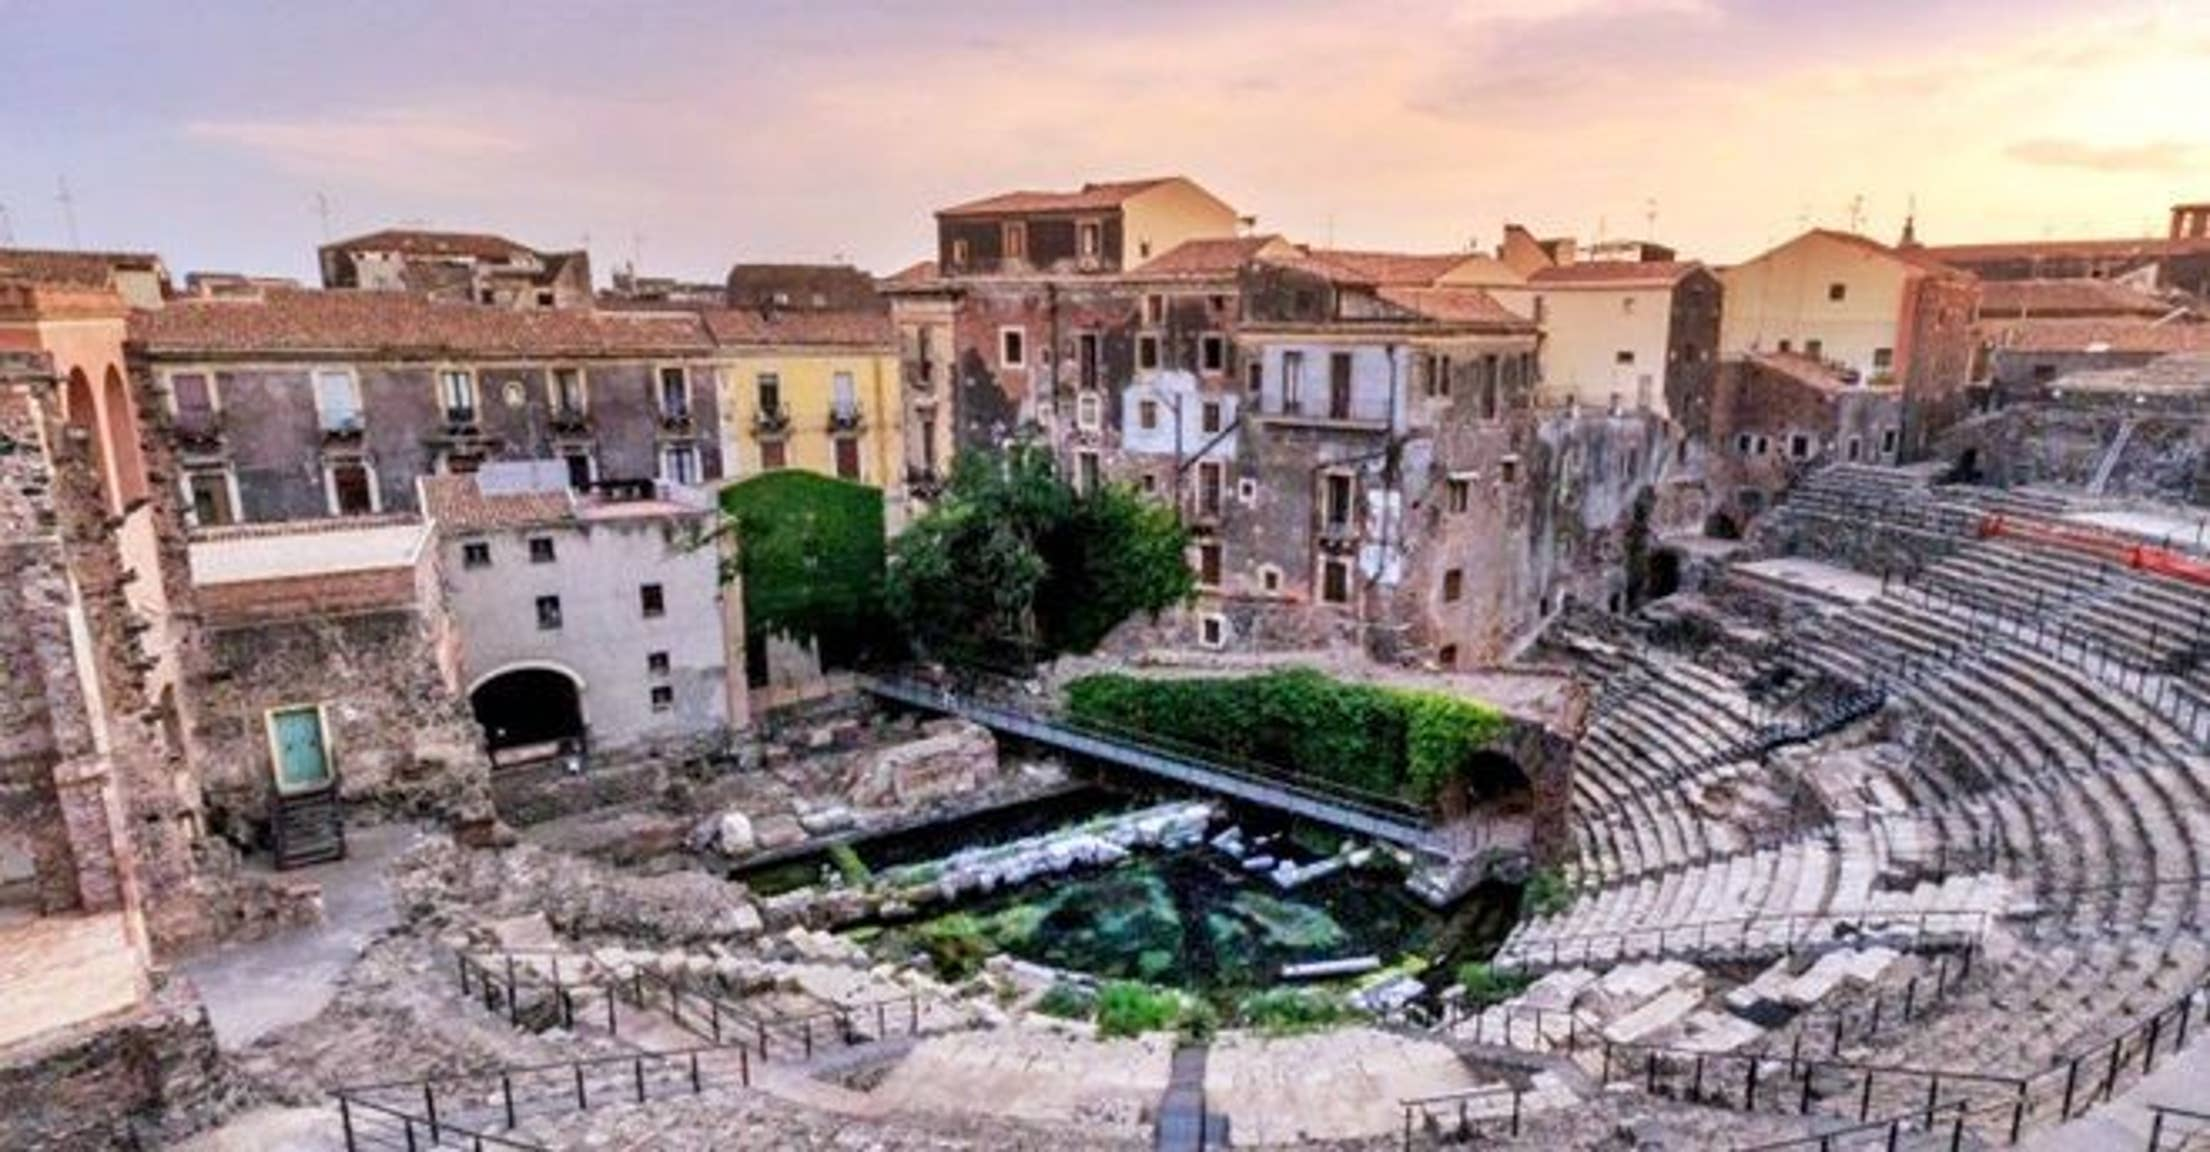 Maison de vacances  (2782175), Catania, Catania, Sicile, Italie, image 41